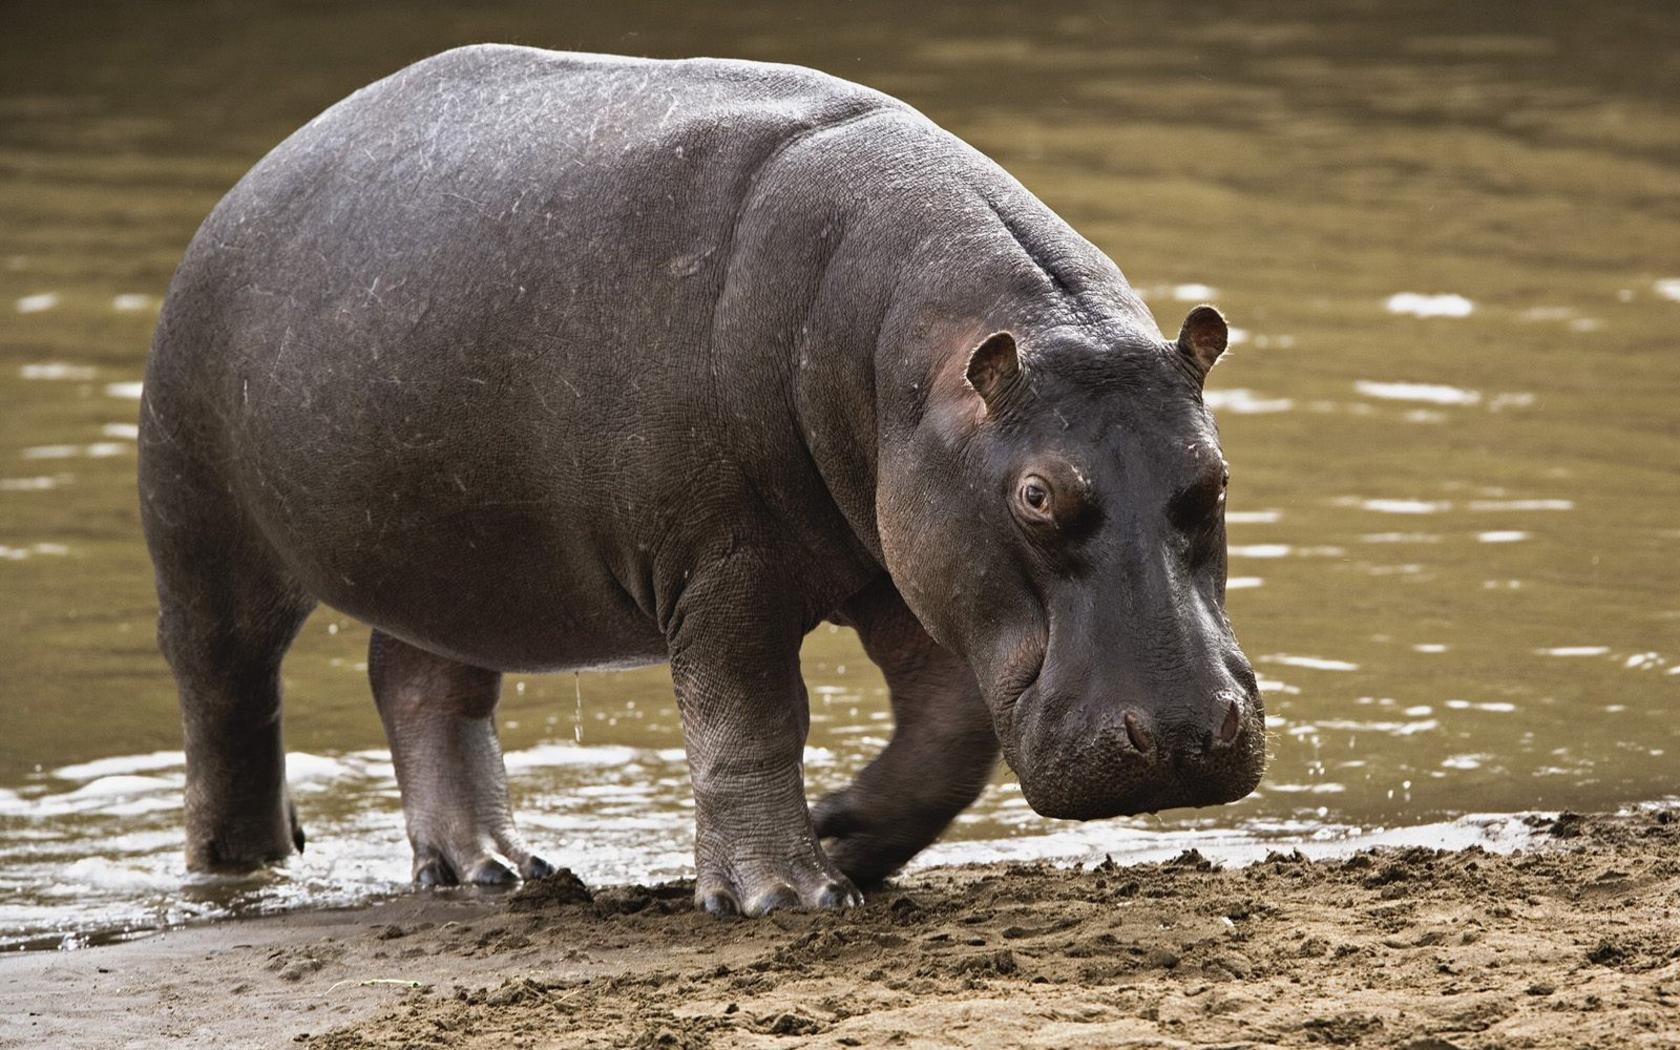 Hippopotamus Wallpapers Wallpaper